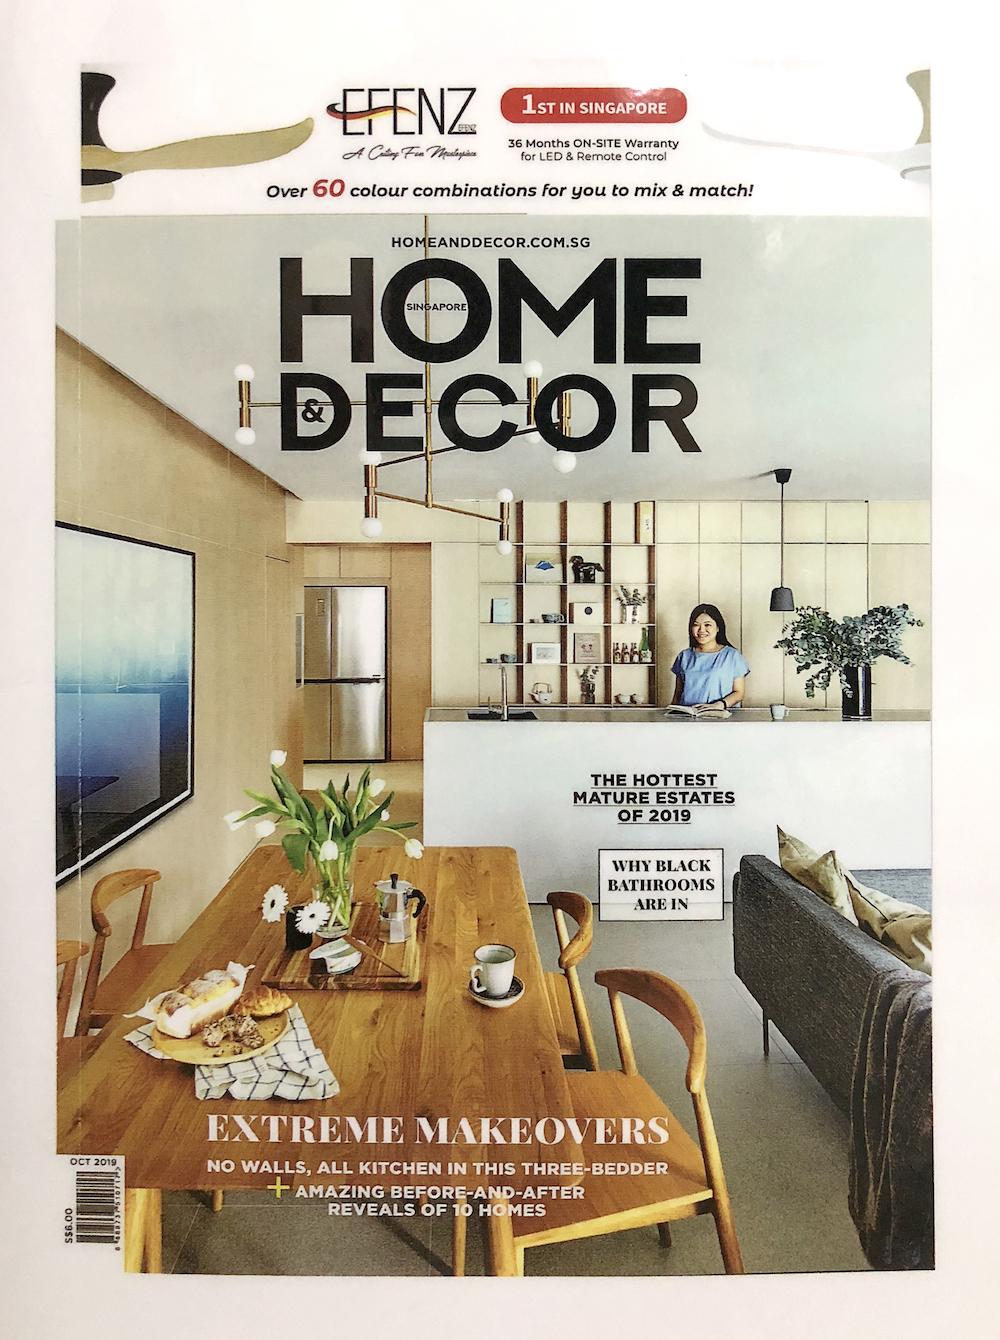 home-and-decor-efenz-sembawang-lighting-house-1.jpg